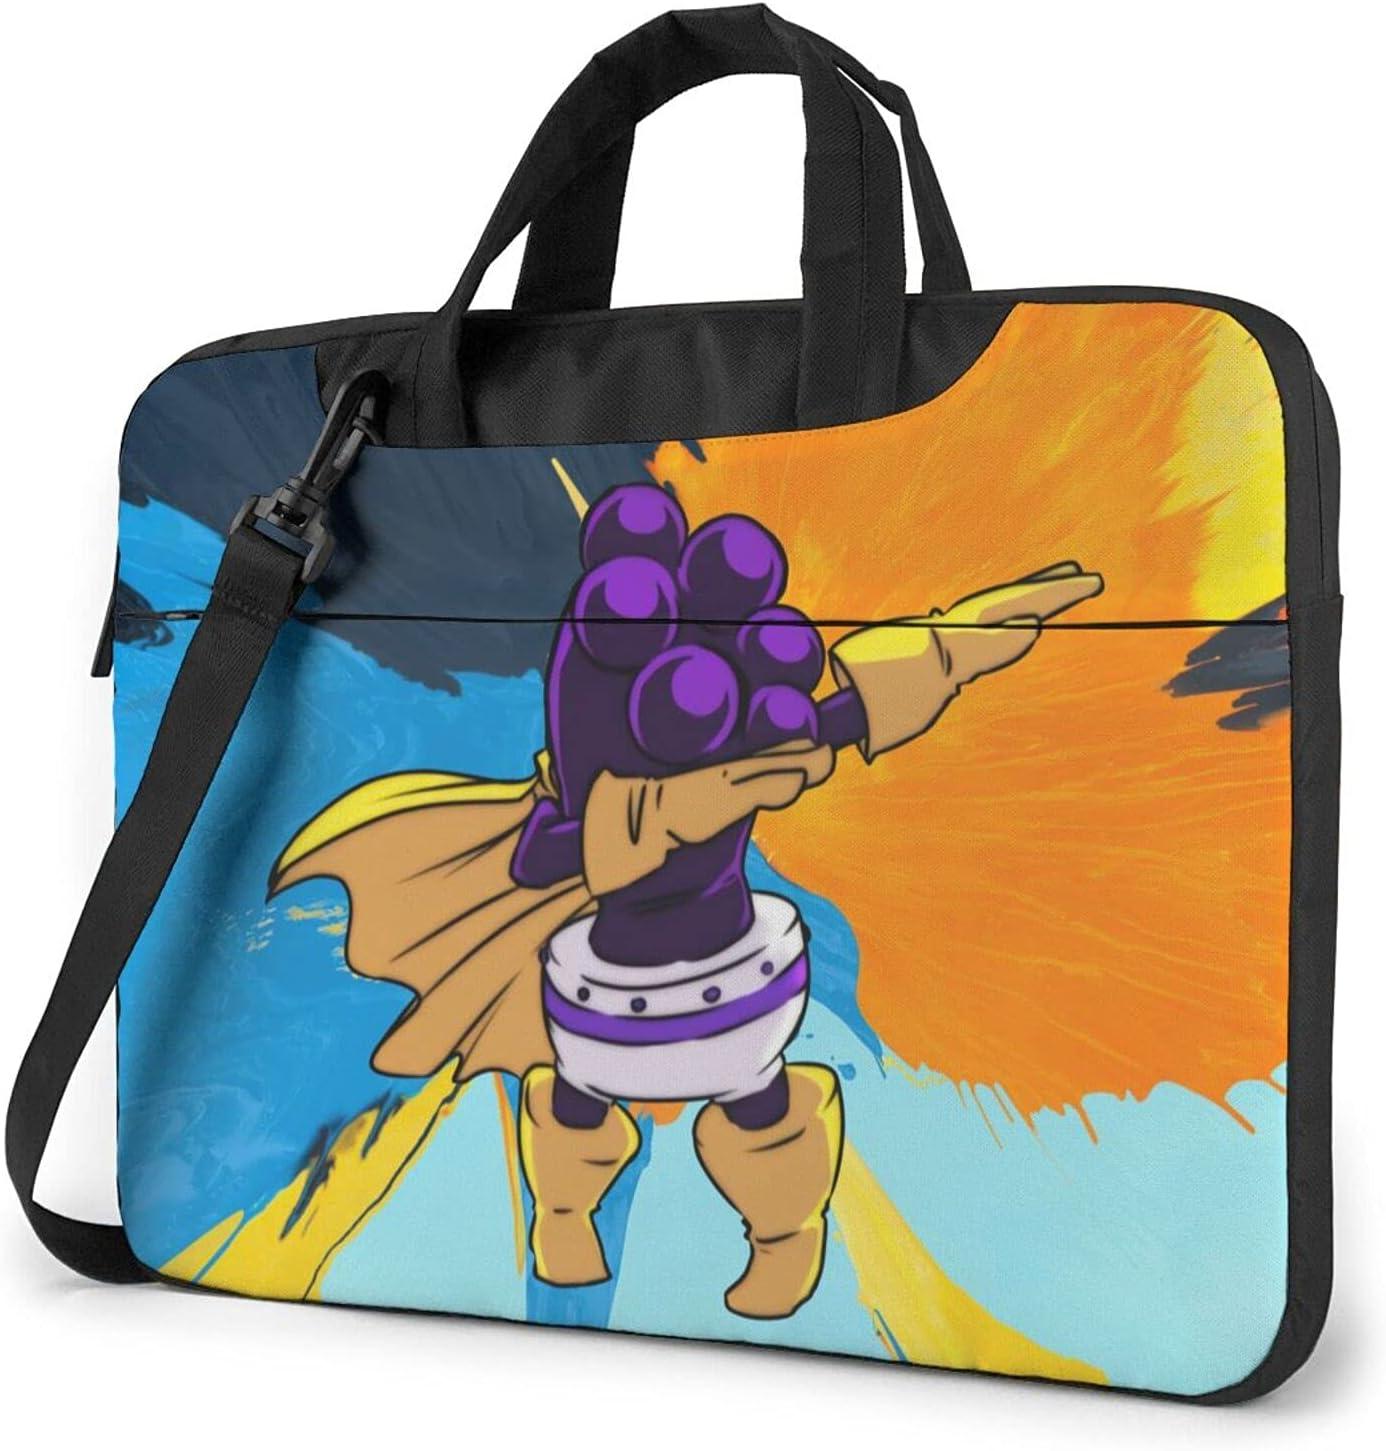 ECHOECVFG My Hero Sale item Academia MINETA bag15.6 Some reservation 14 Laptop inch 13